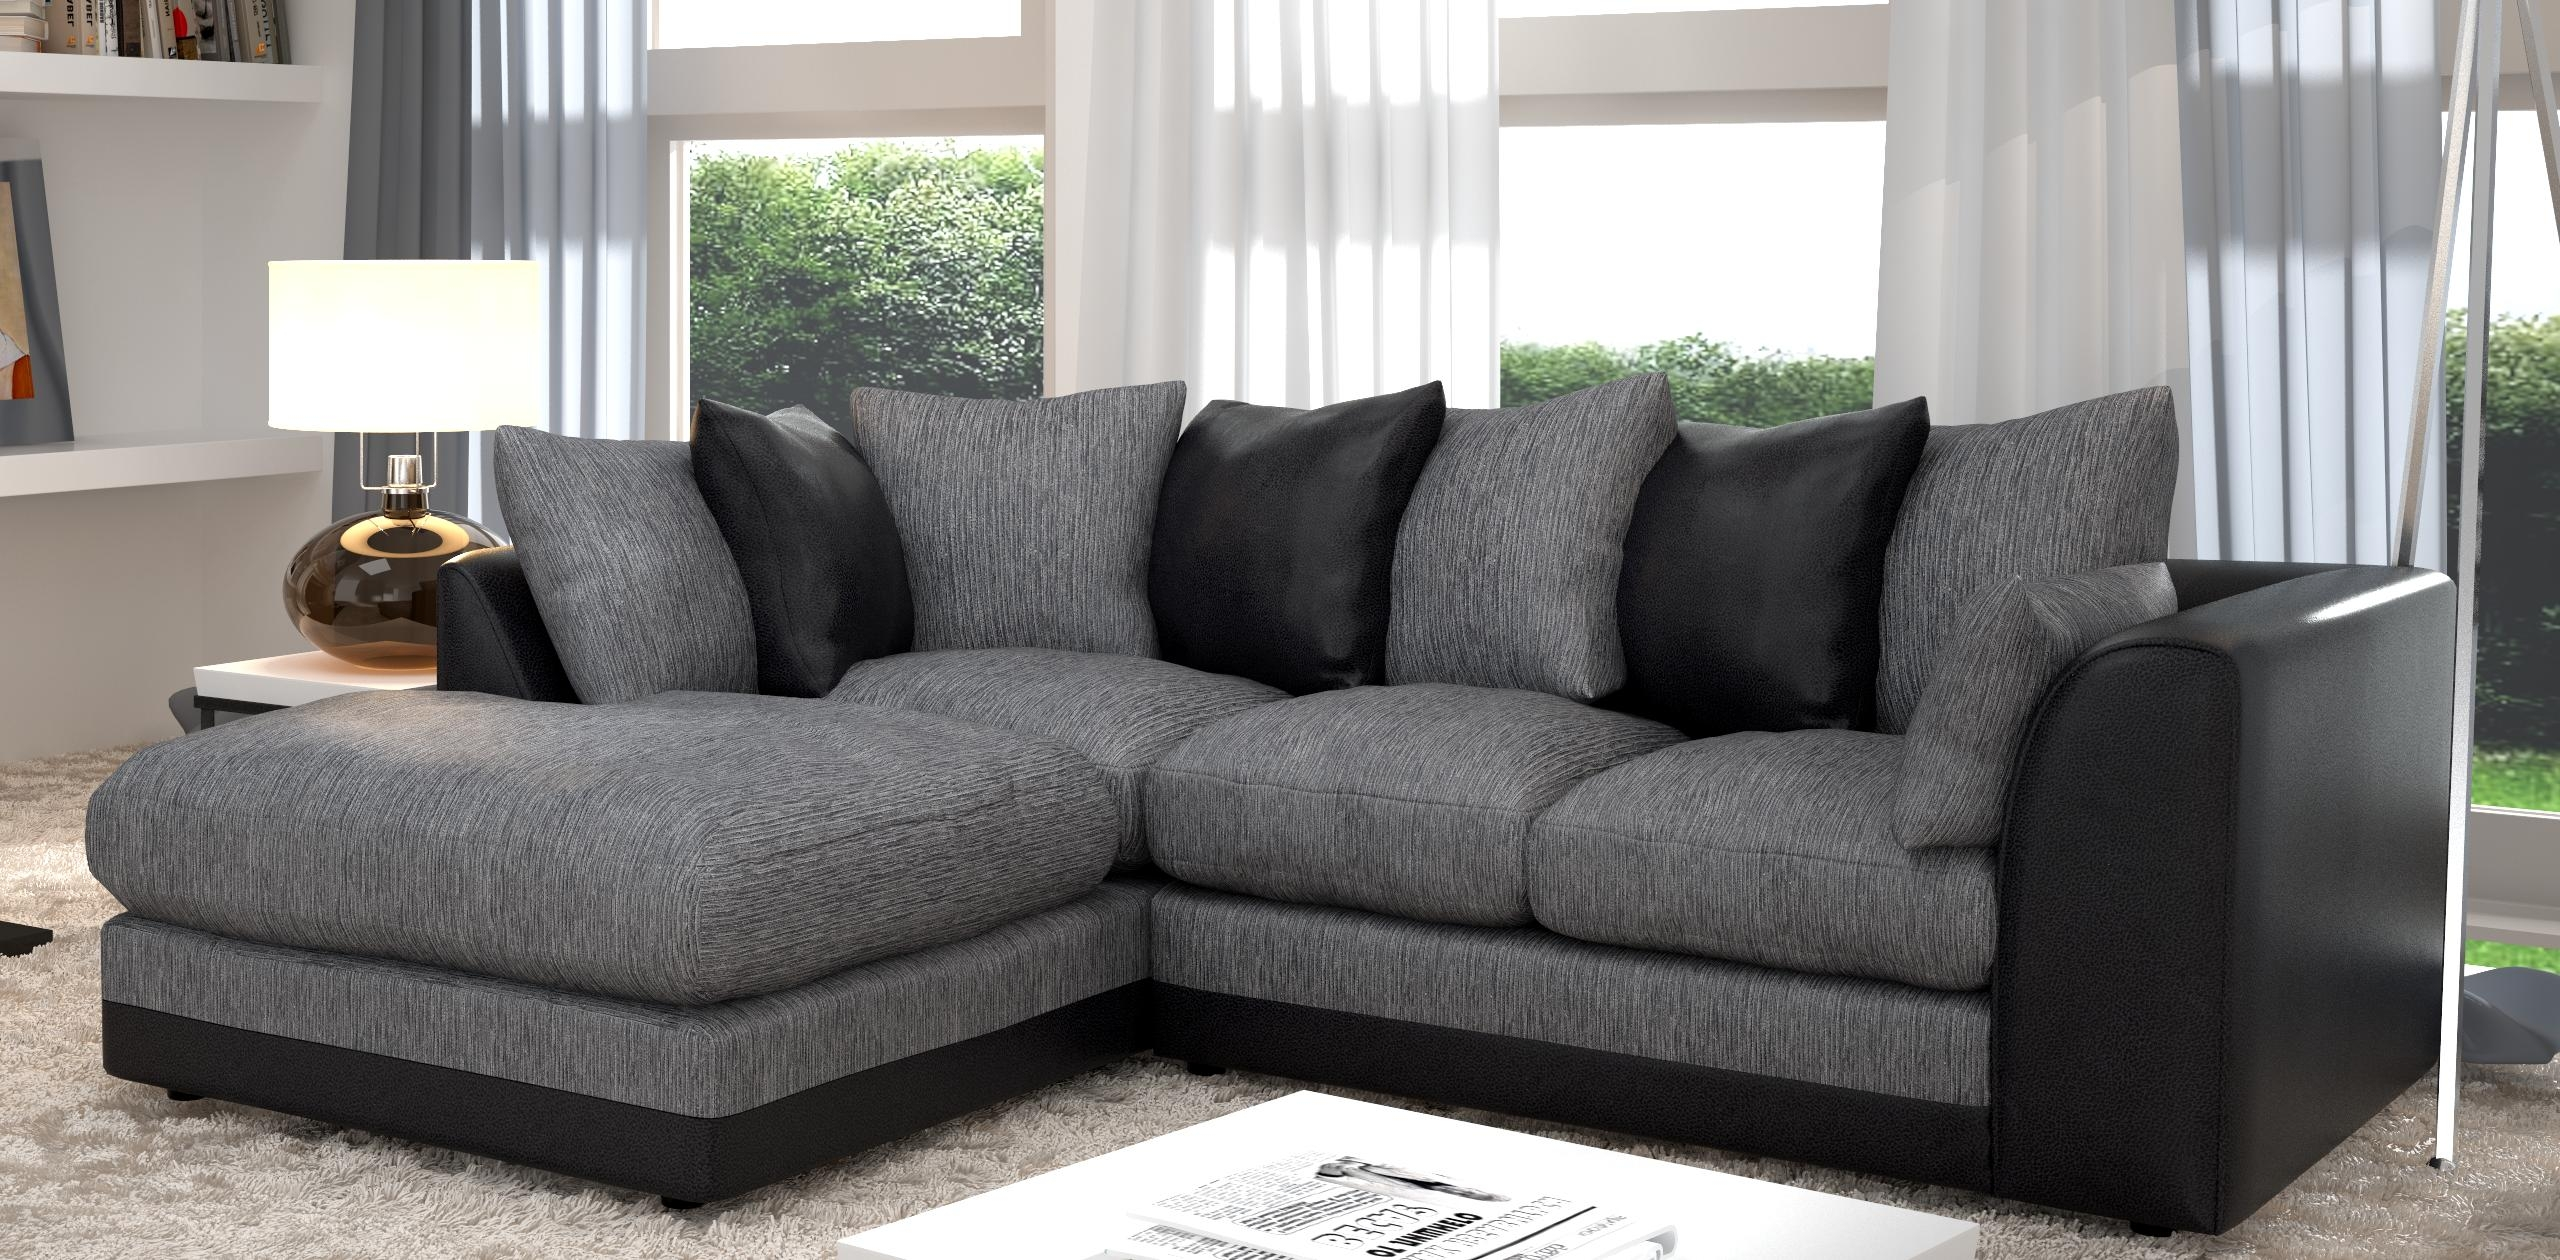 20 choices of black corner sofas sofa ideas for Black and grey sofa